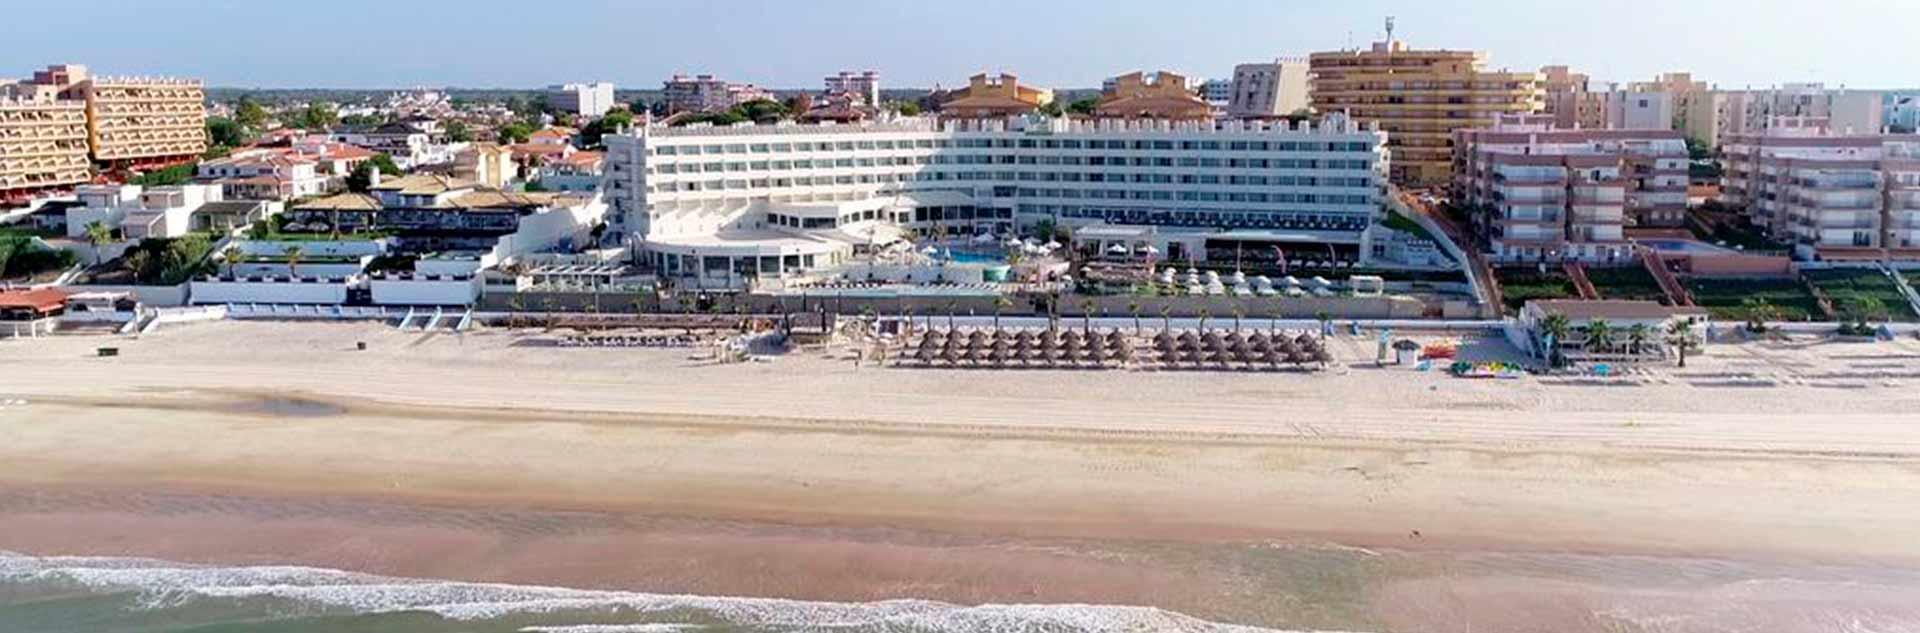 On Hotels Ocenafront 4* de Matalascañas, Huelva